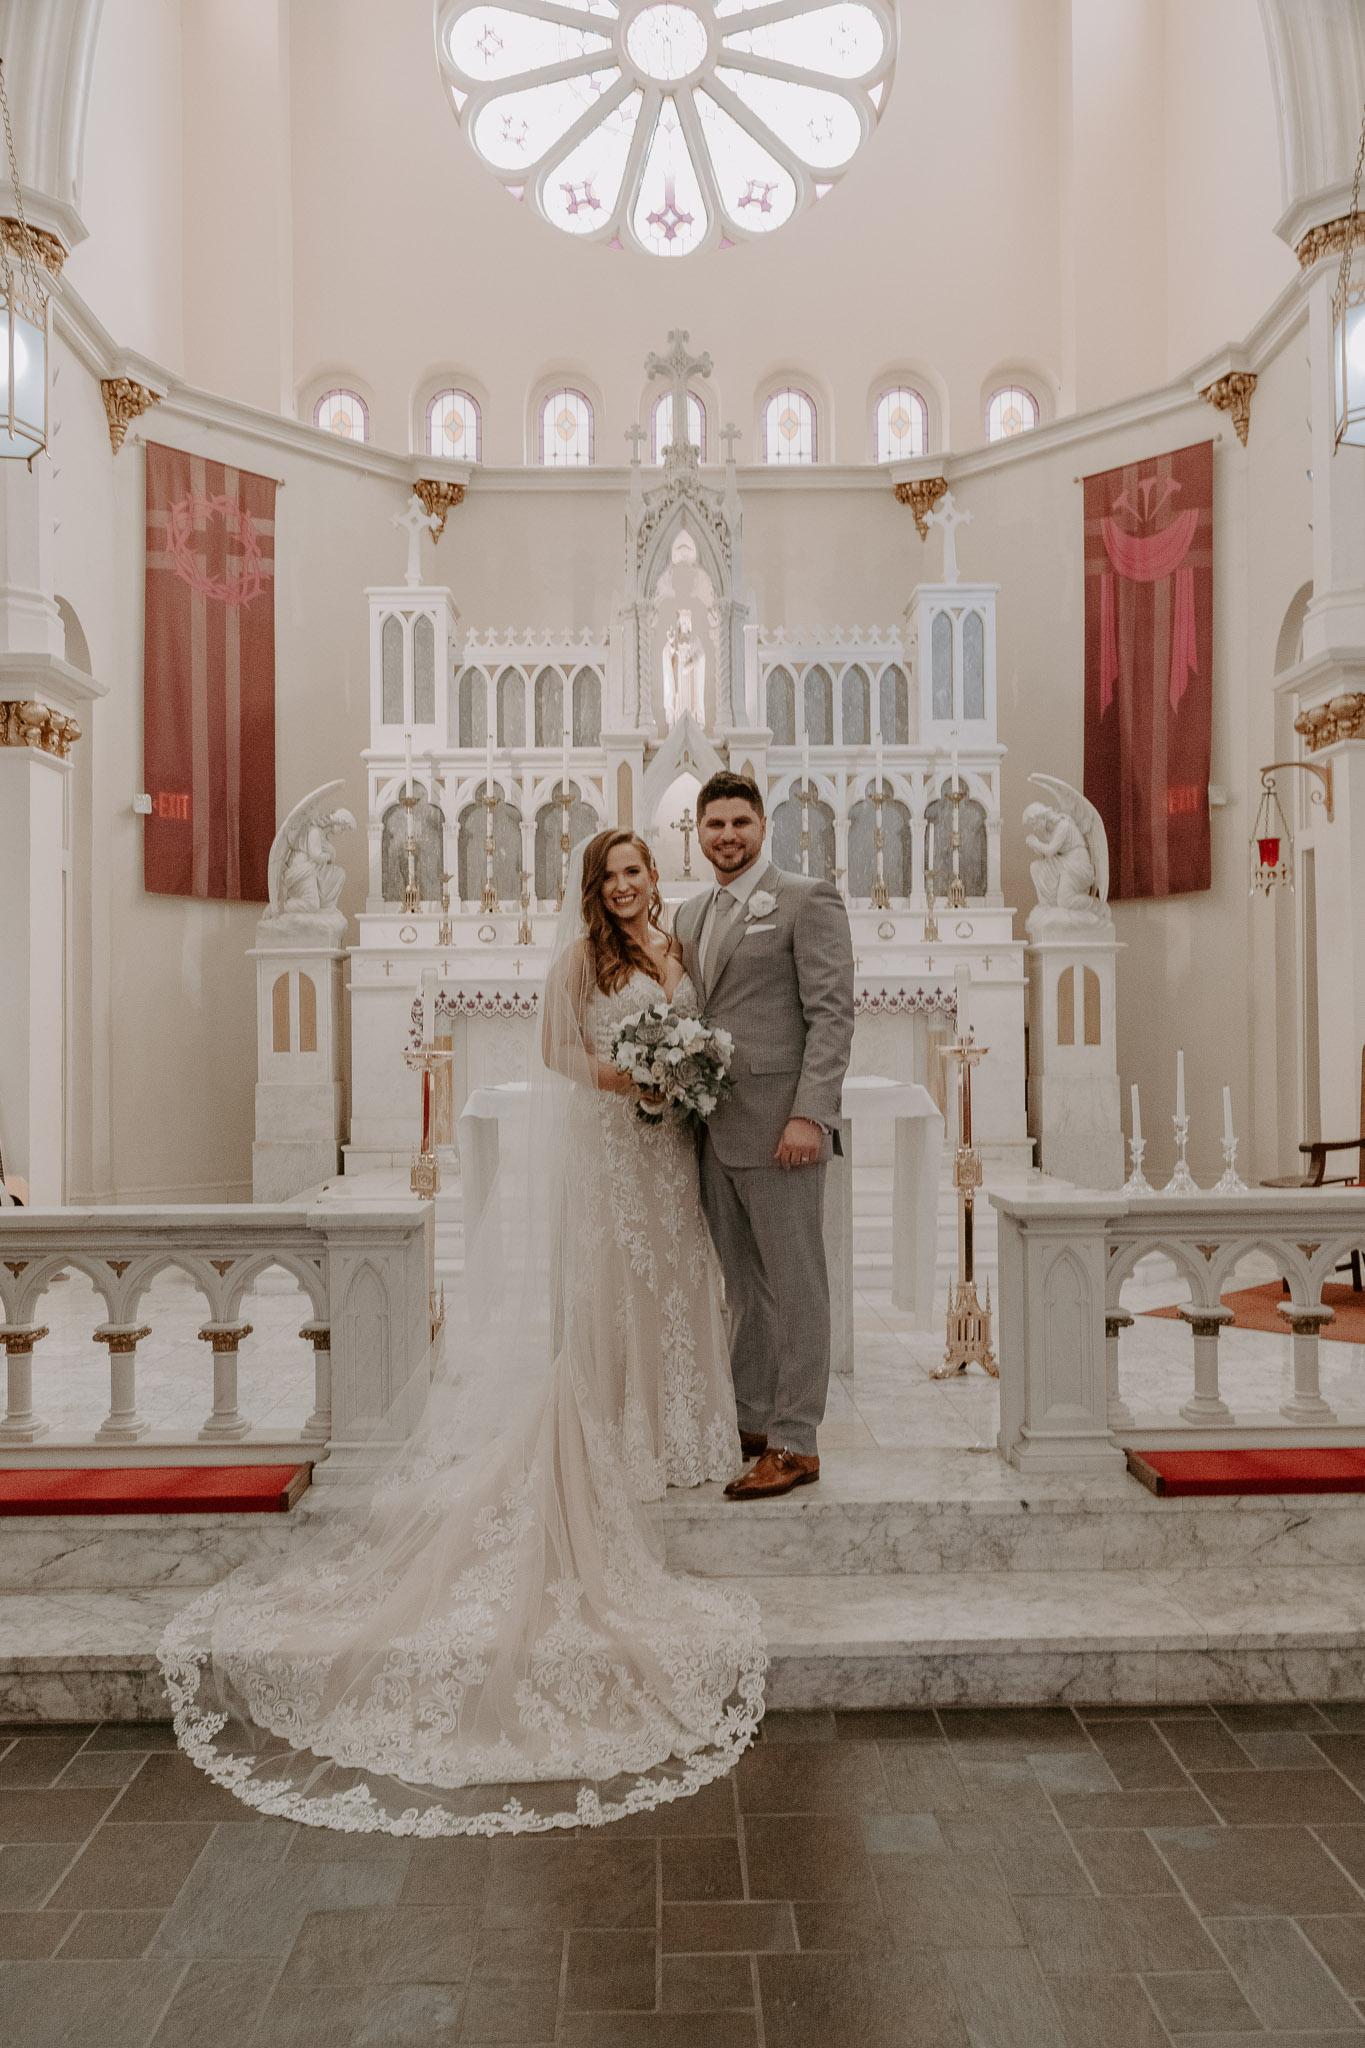 Catholic Houston Texas Flare Wedding Bell Tower-7931.jpg